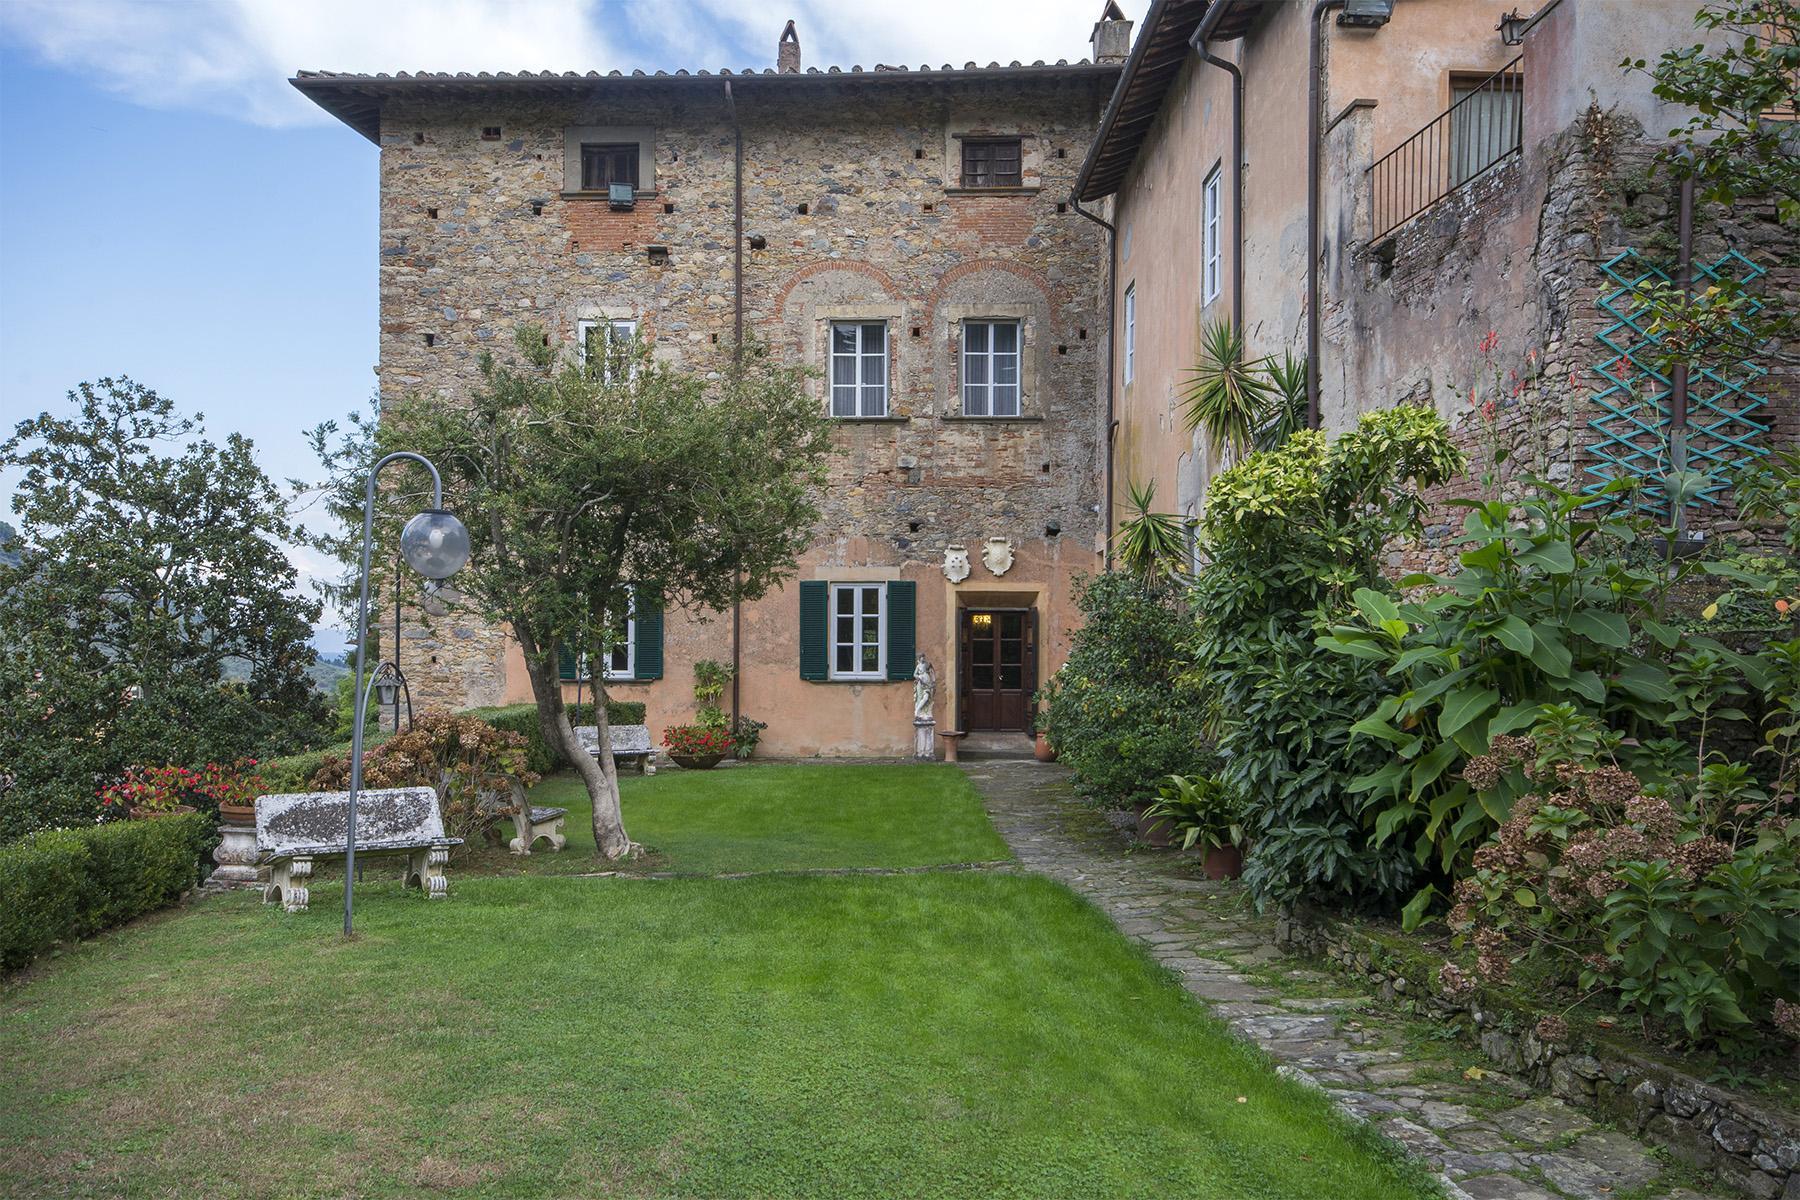 Wonderful Medicean Villa on the Pisan hills - 3